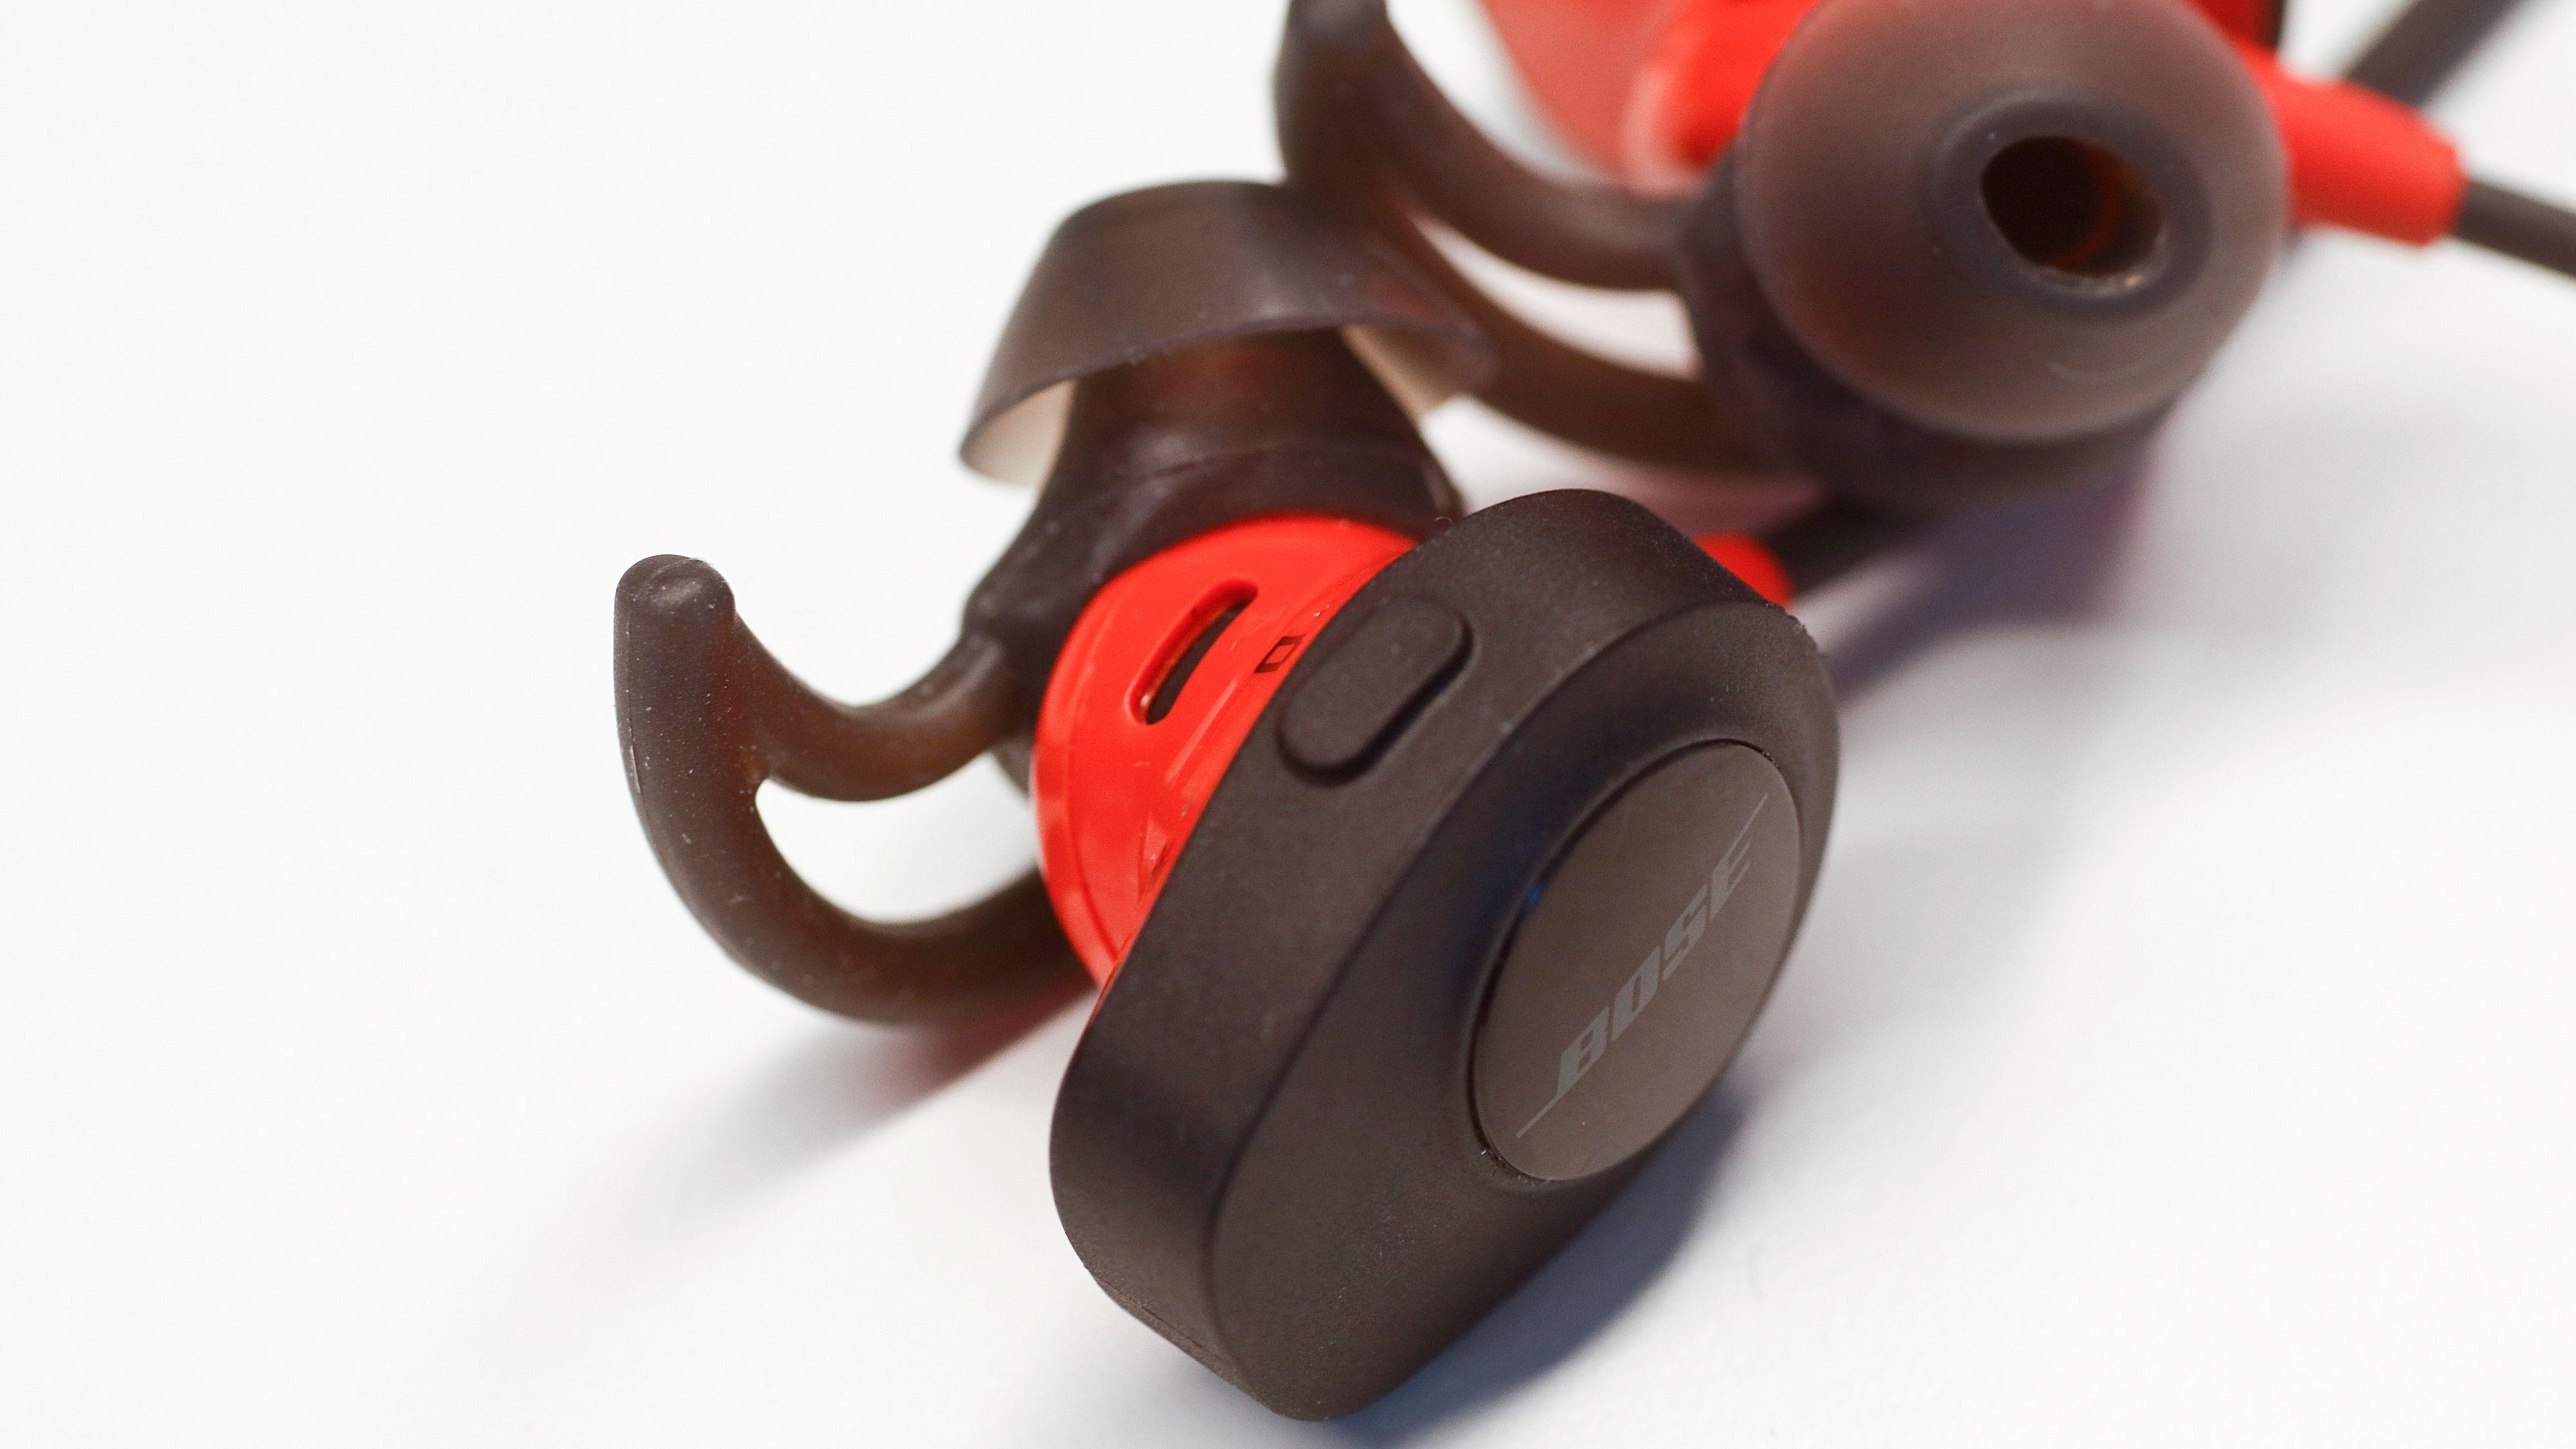 Boses StayHear-ørevinger er blant de aller mest behagelige på markedet.